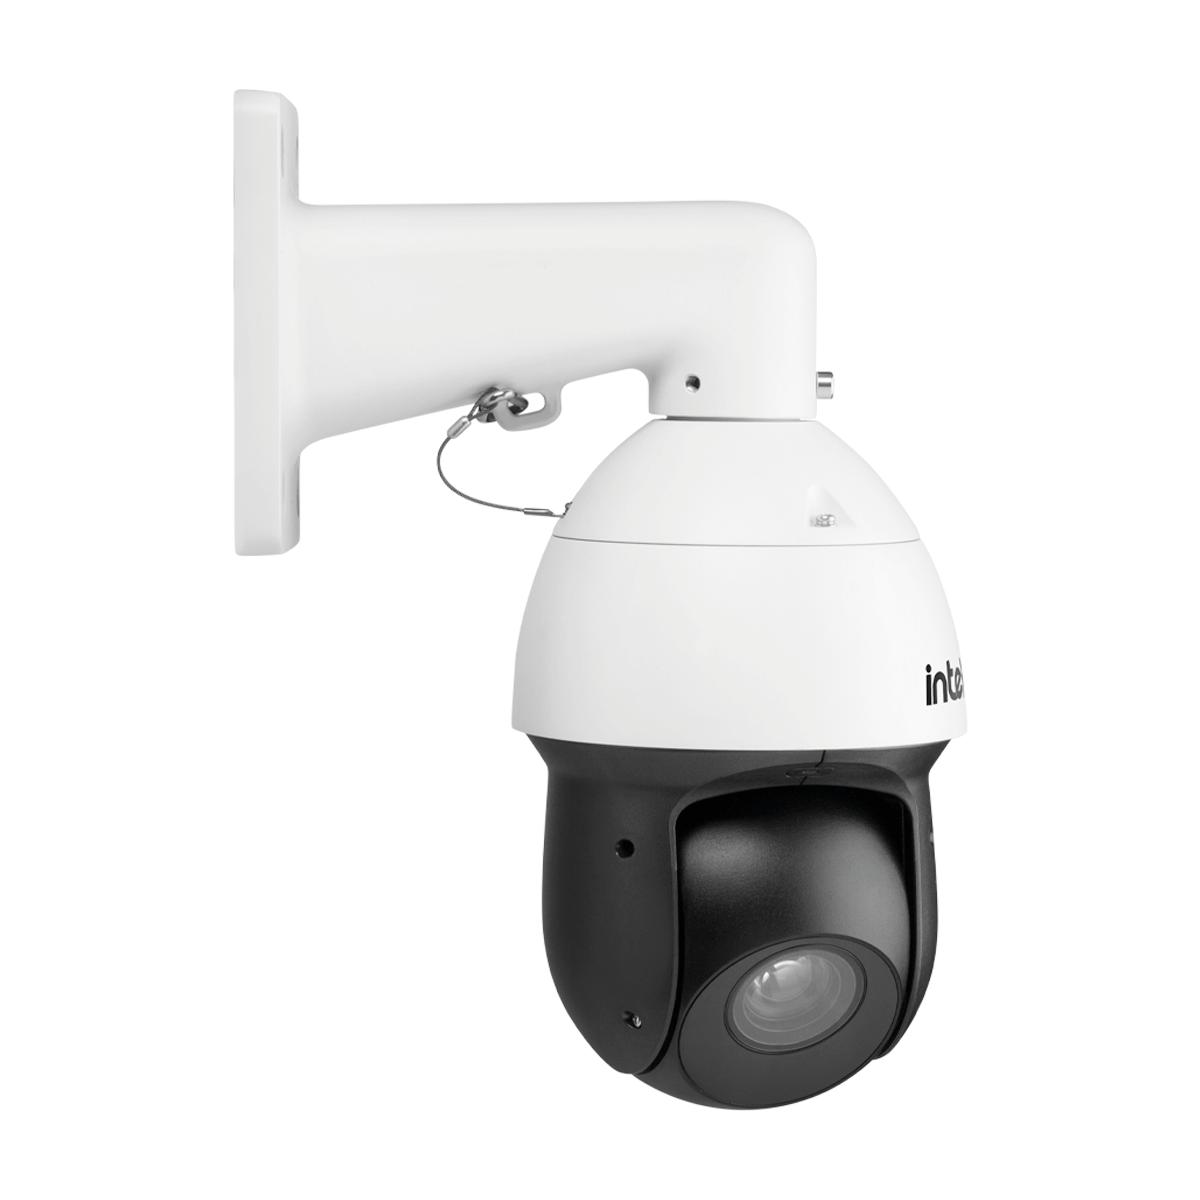 Câmera Speed Dome HDCVI Intelbras VHD 5225 SD IR